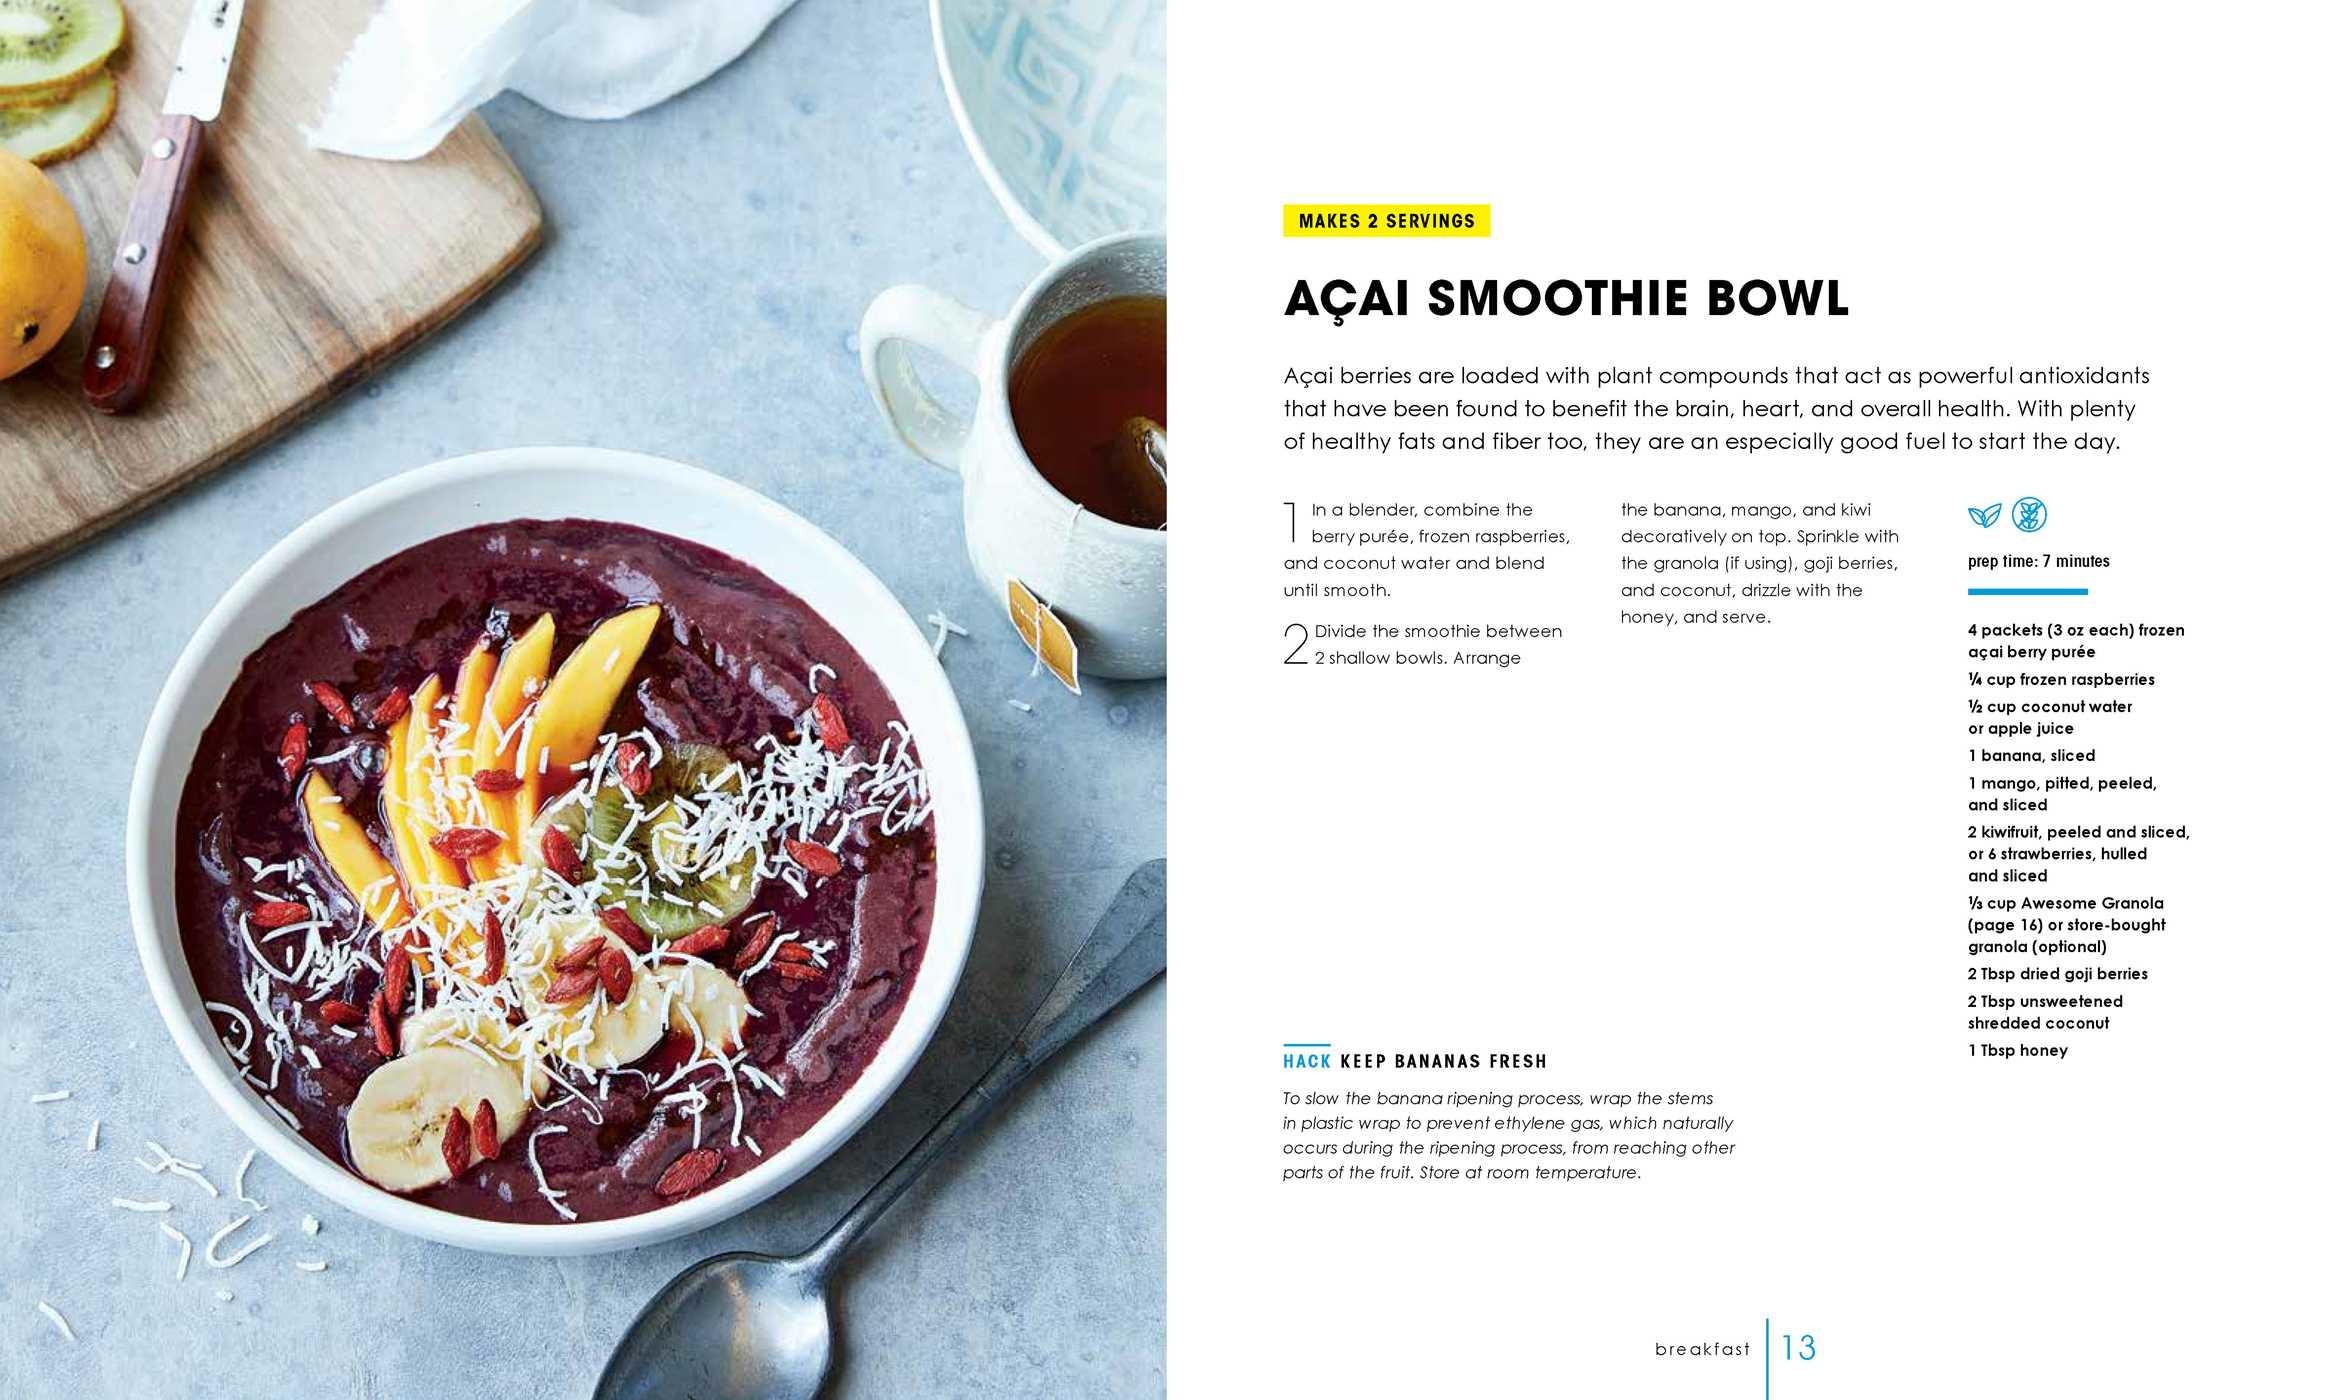 The college cookbook 9781681884363.in02